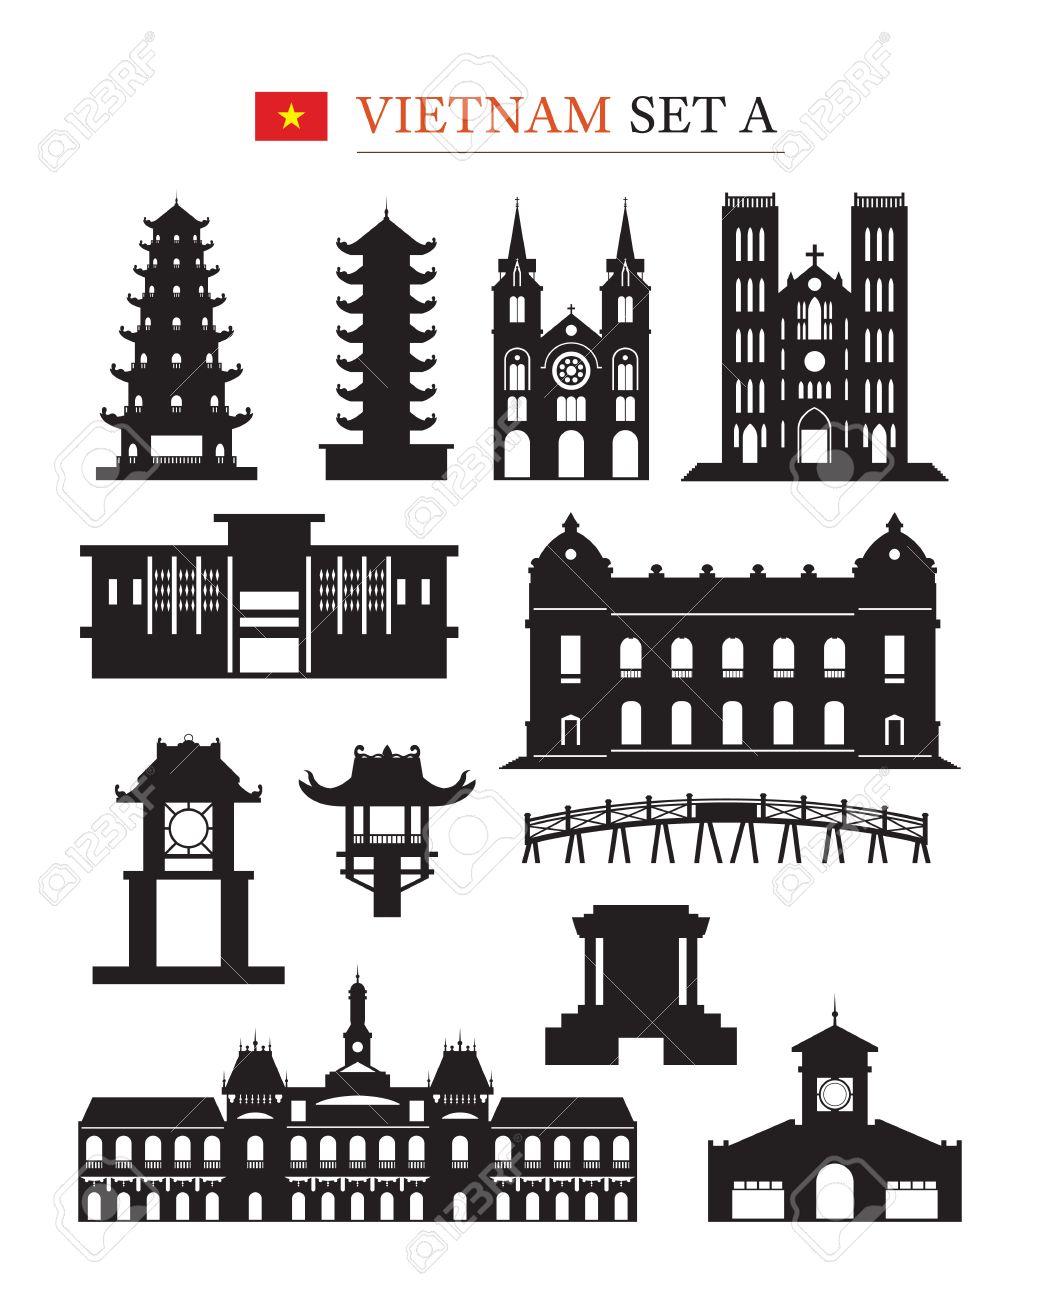 Vietnam Landmarks Architecture Building Object Set Design